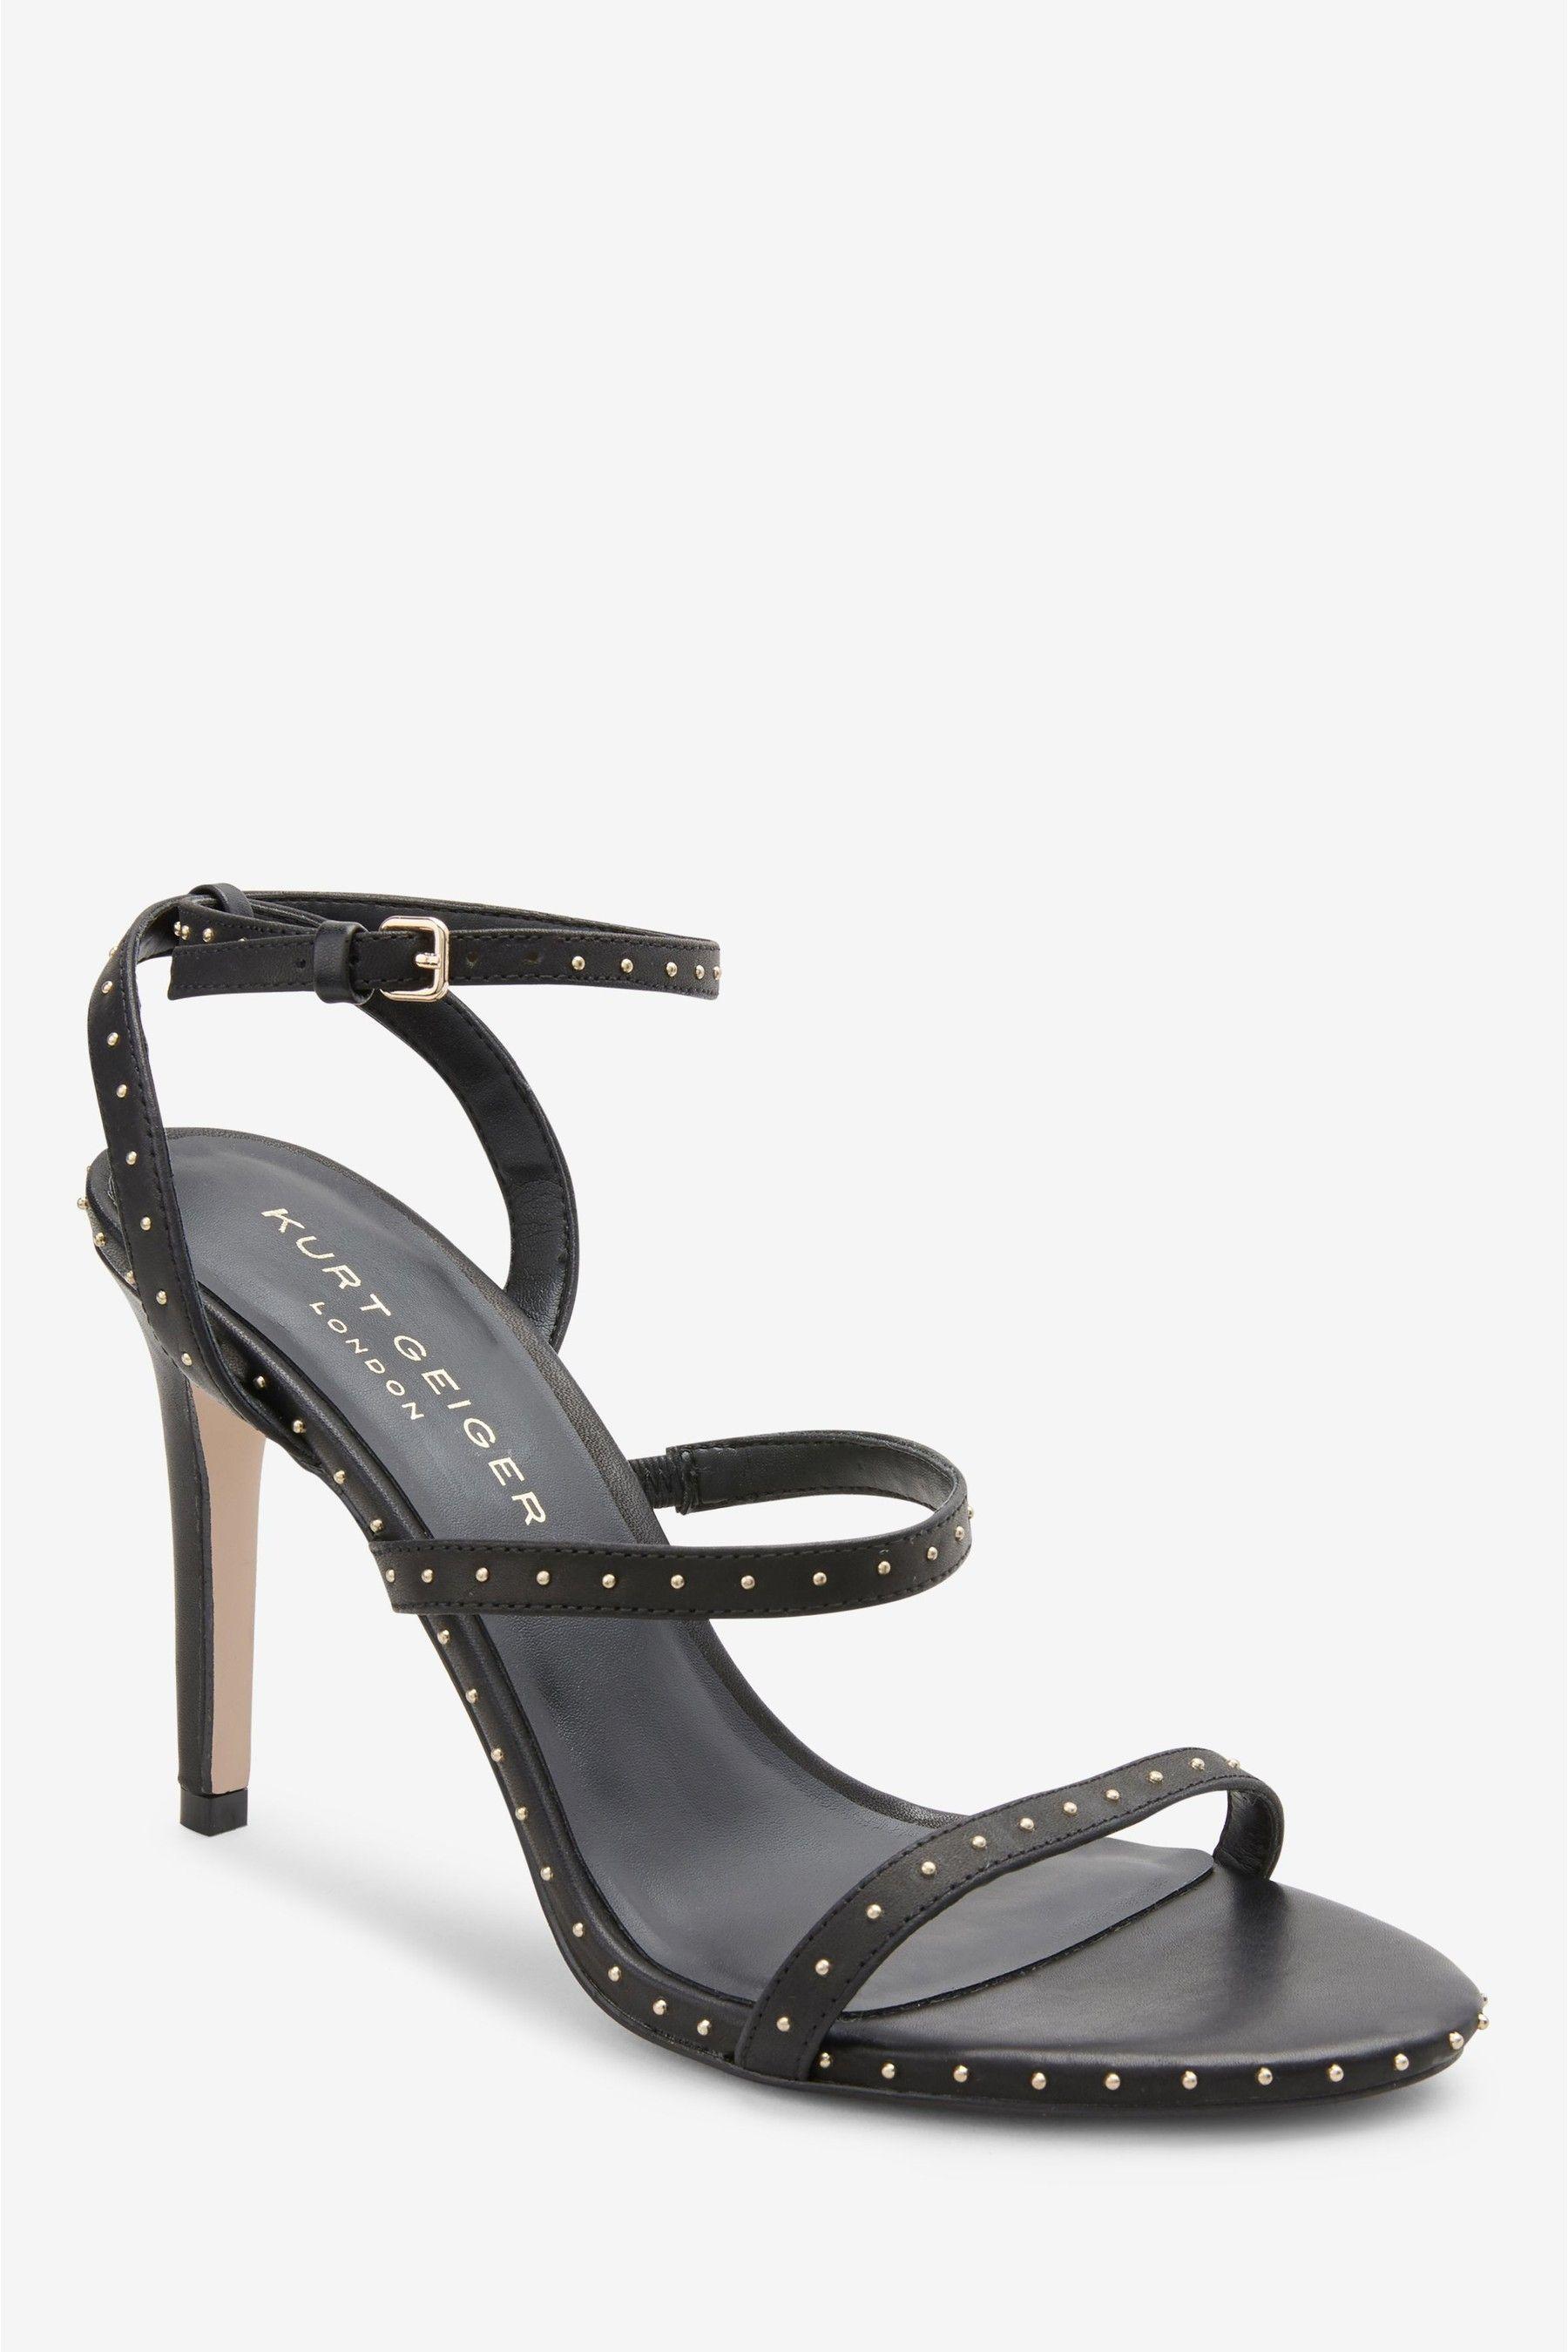 Womens Kurt Geiger Black Portia Stud Heeled Sandal Black Studded Heels Black Sandals Heels Sandals Heels